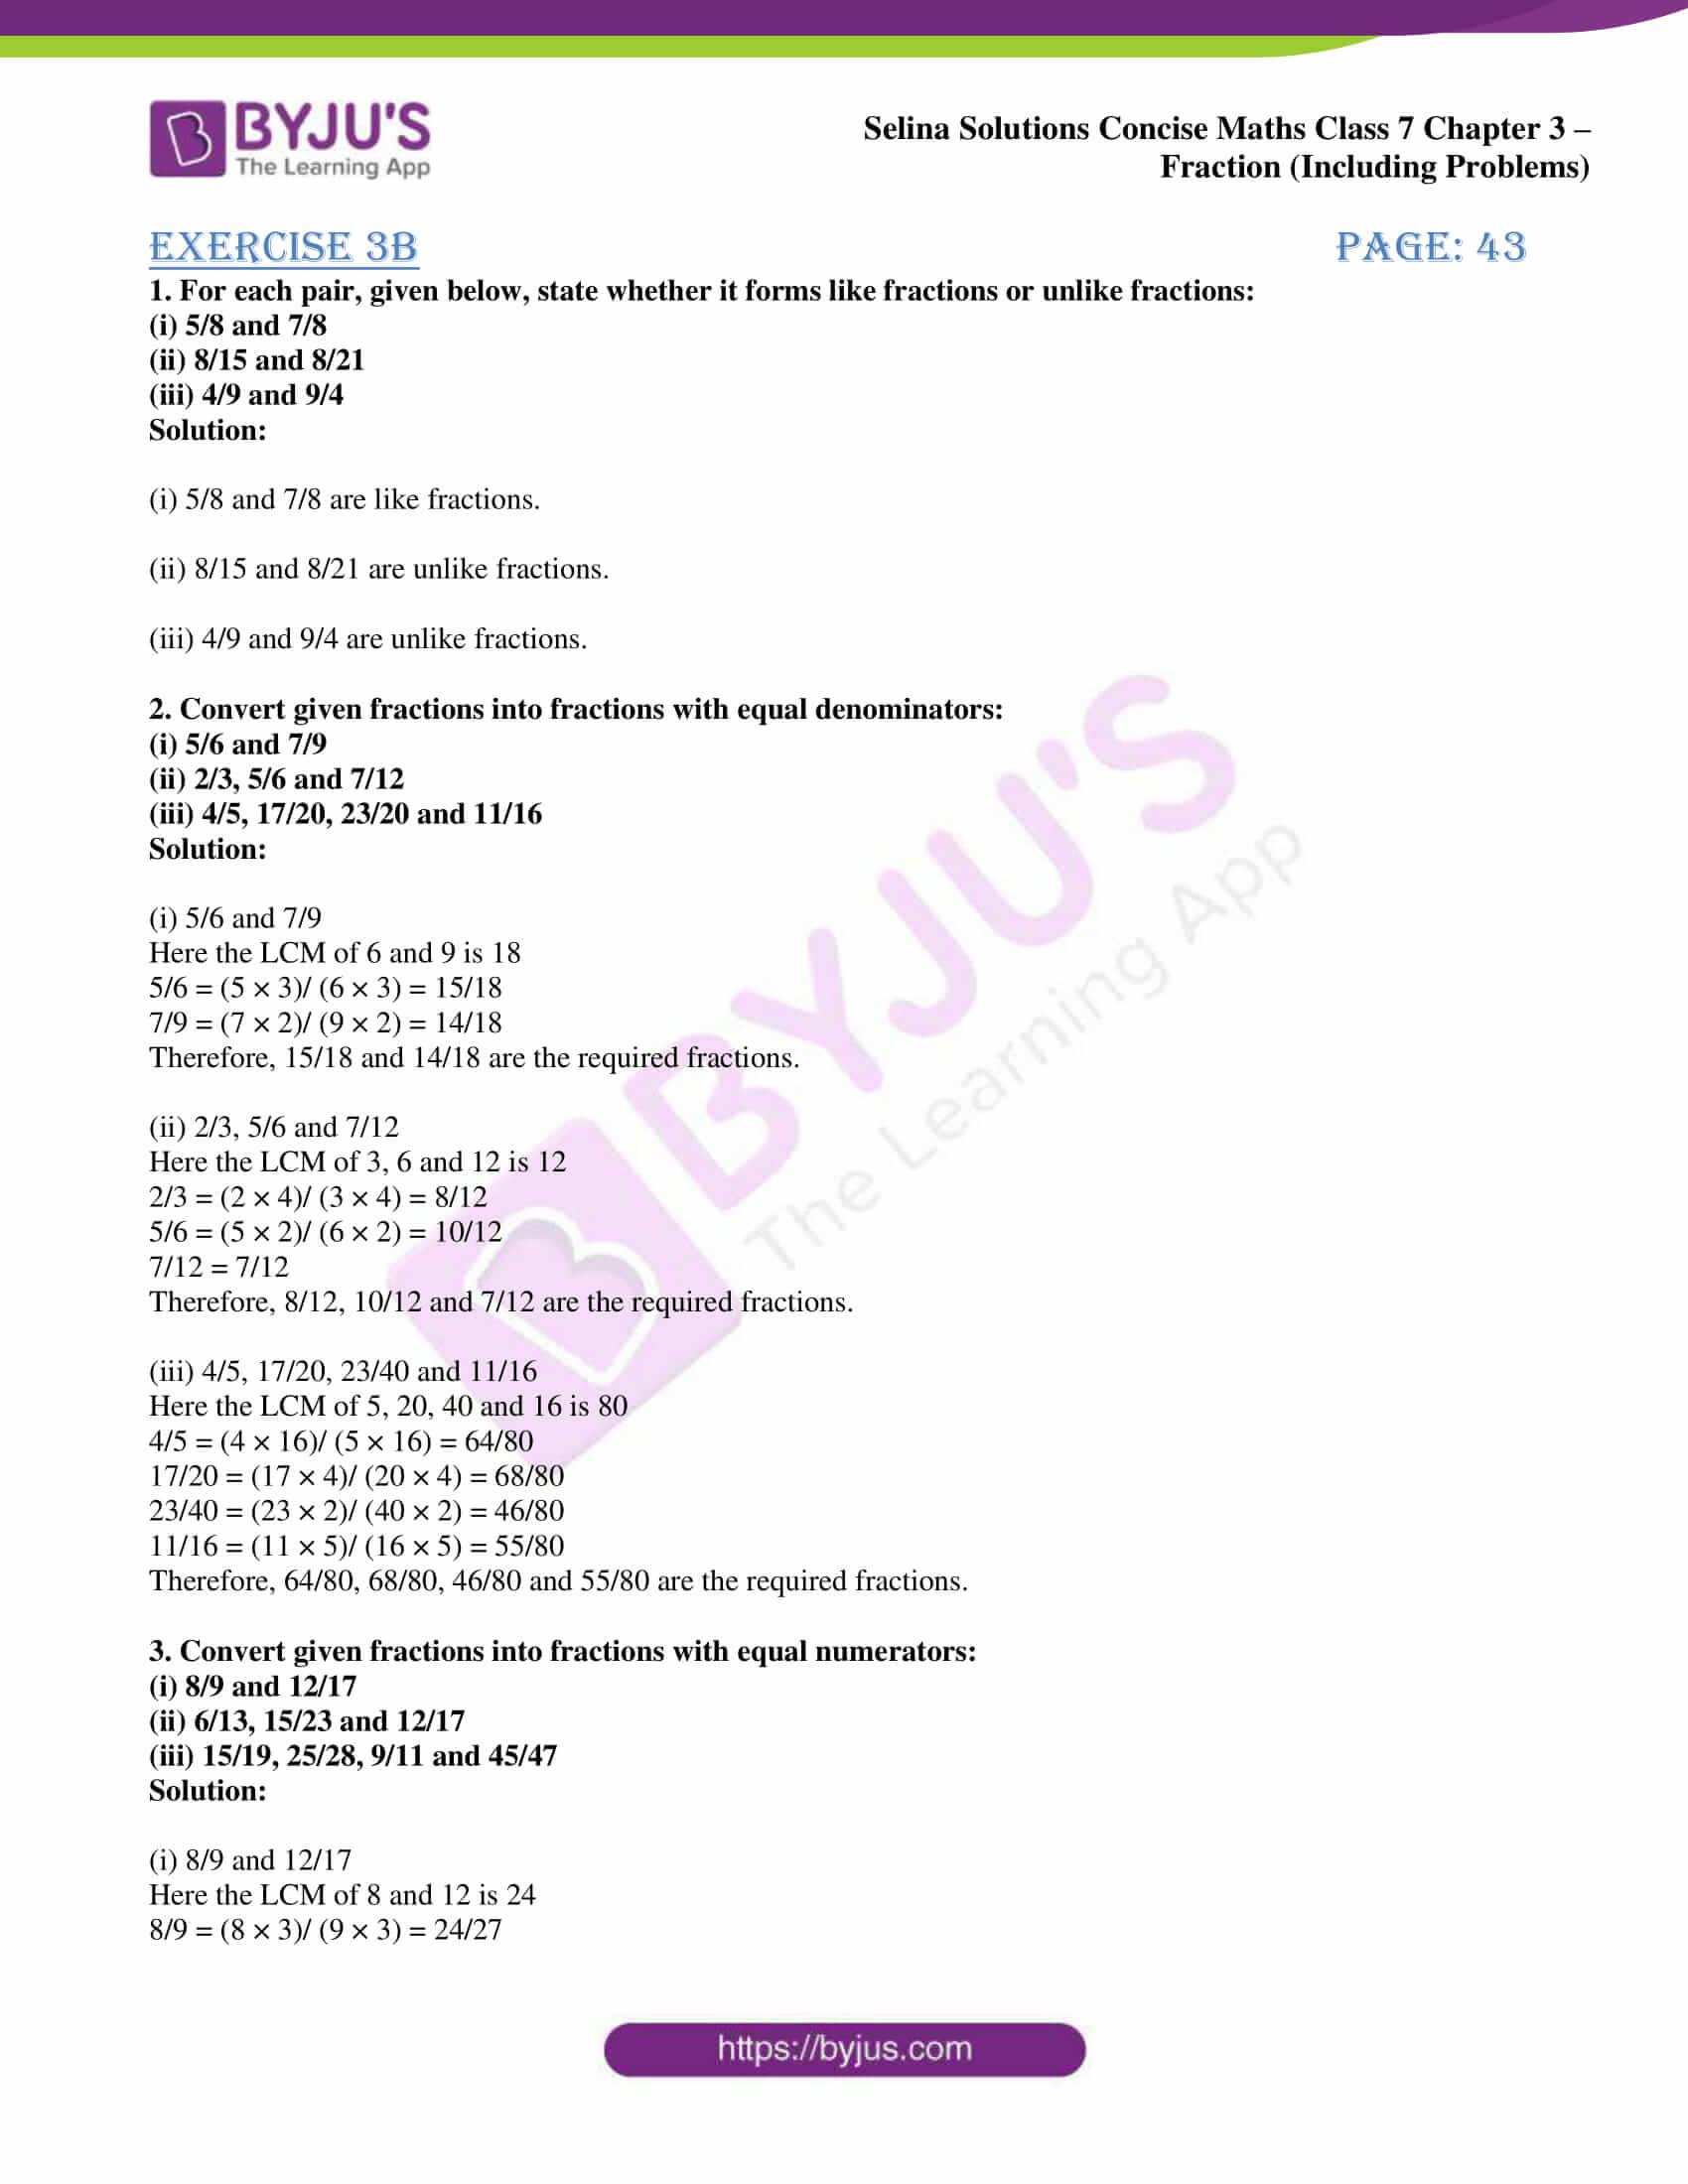 selina sol concise maths class 7 ch3 ex 3b 1